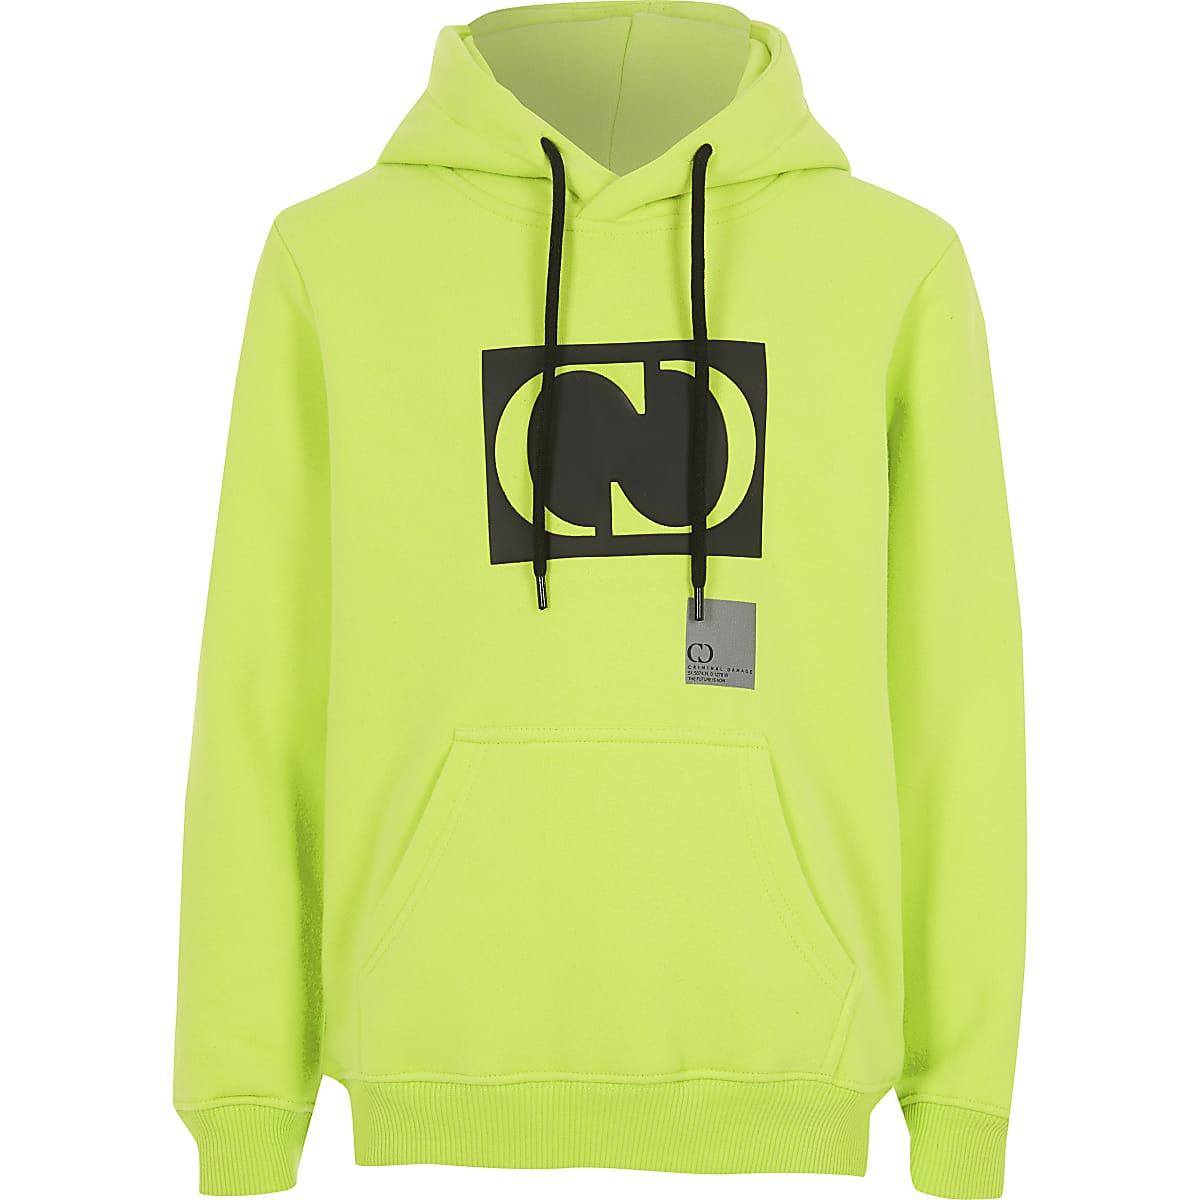 Boys Criminal Damage lime green hoodie